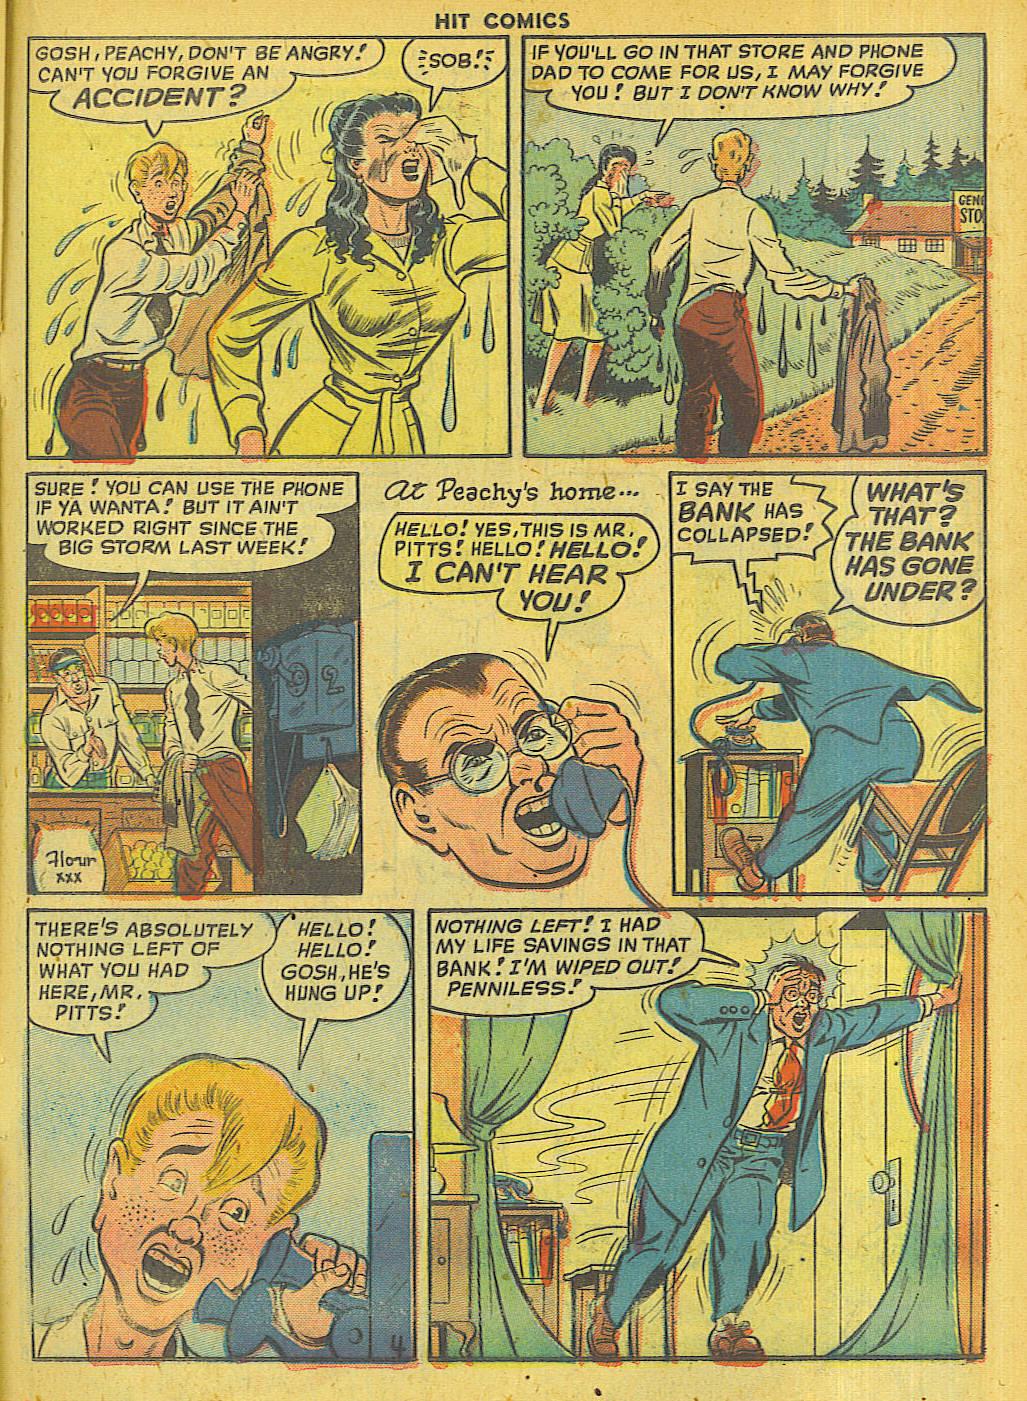 Read online Hit Comics comic -  Issue #56 - 29